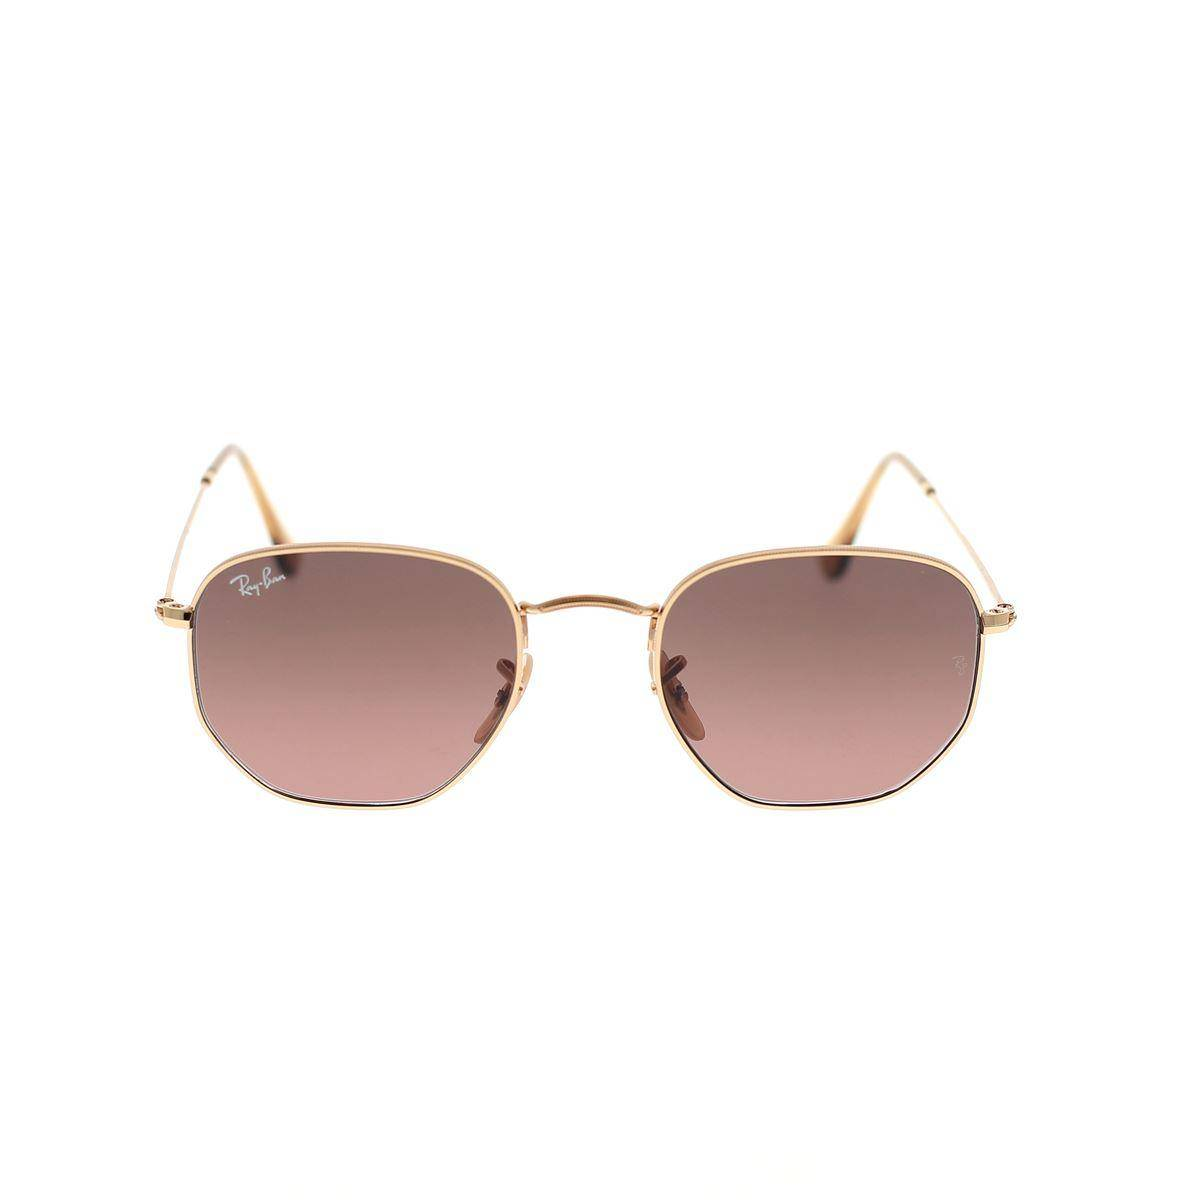 ray-ban occhiali da sole hexagonal rb3548n 912443